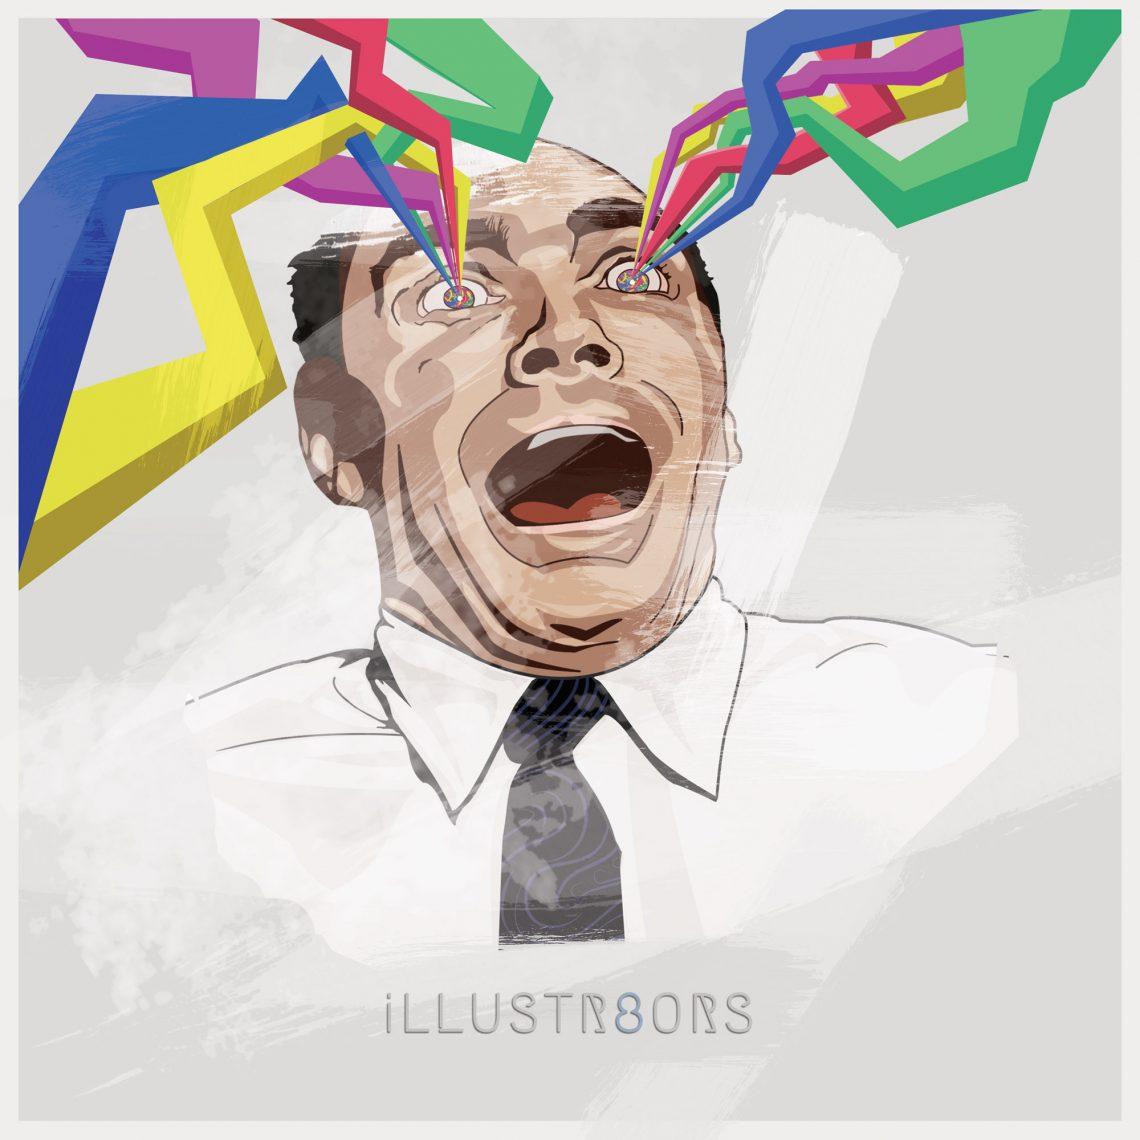 illustr8ors – Debut E.P Review